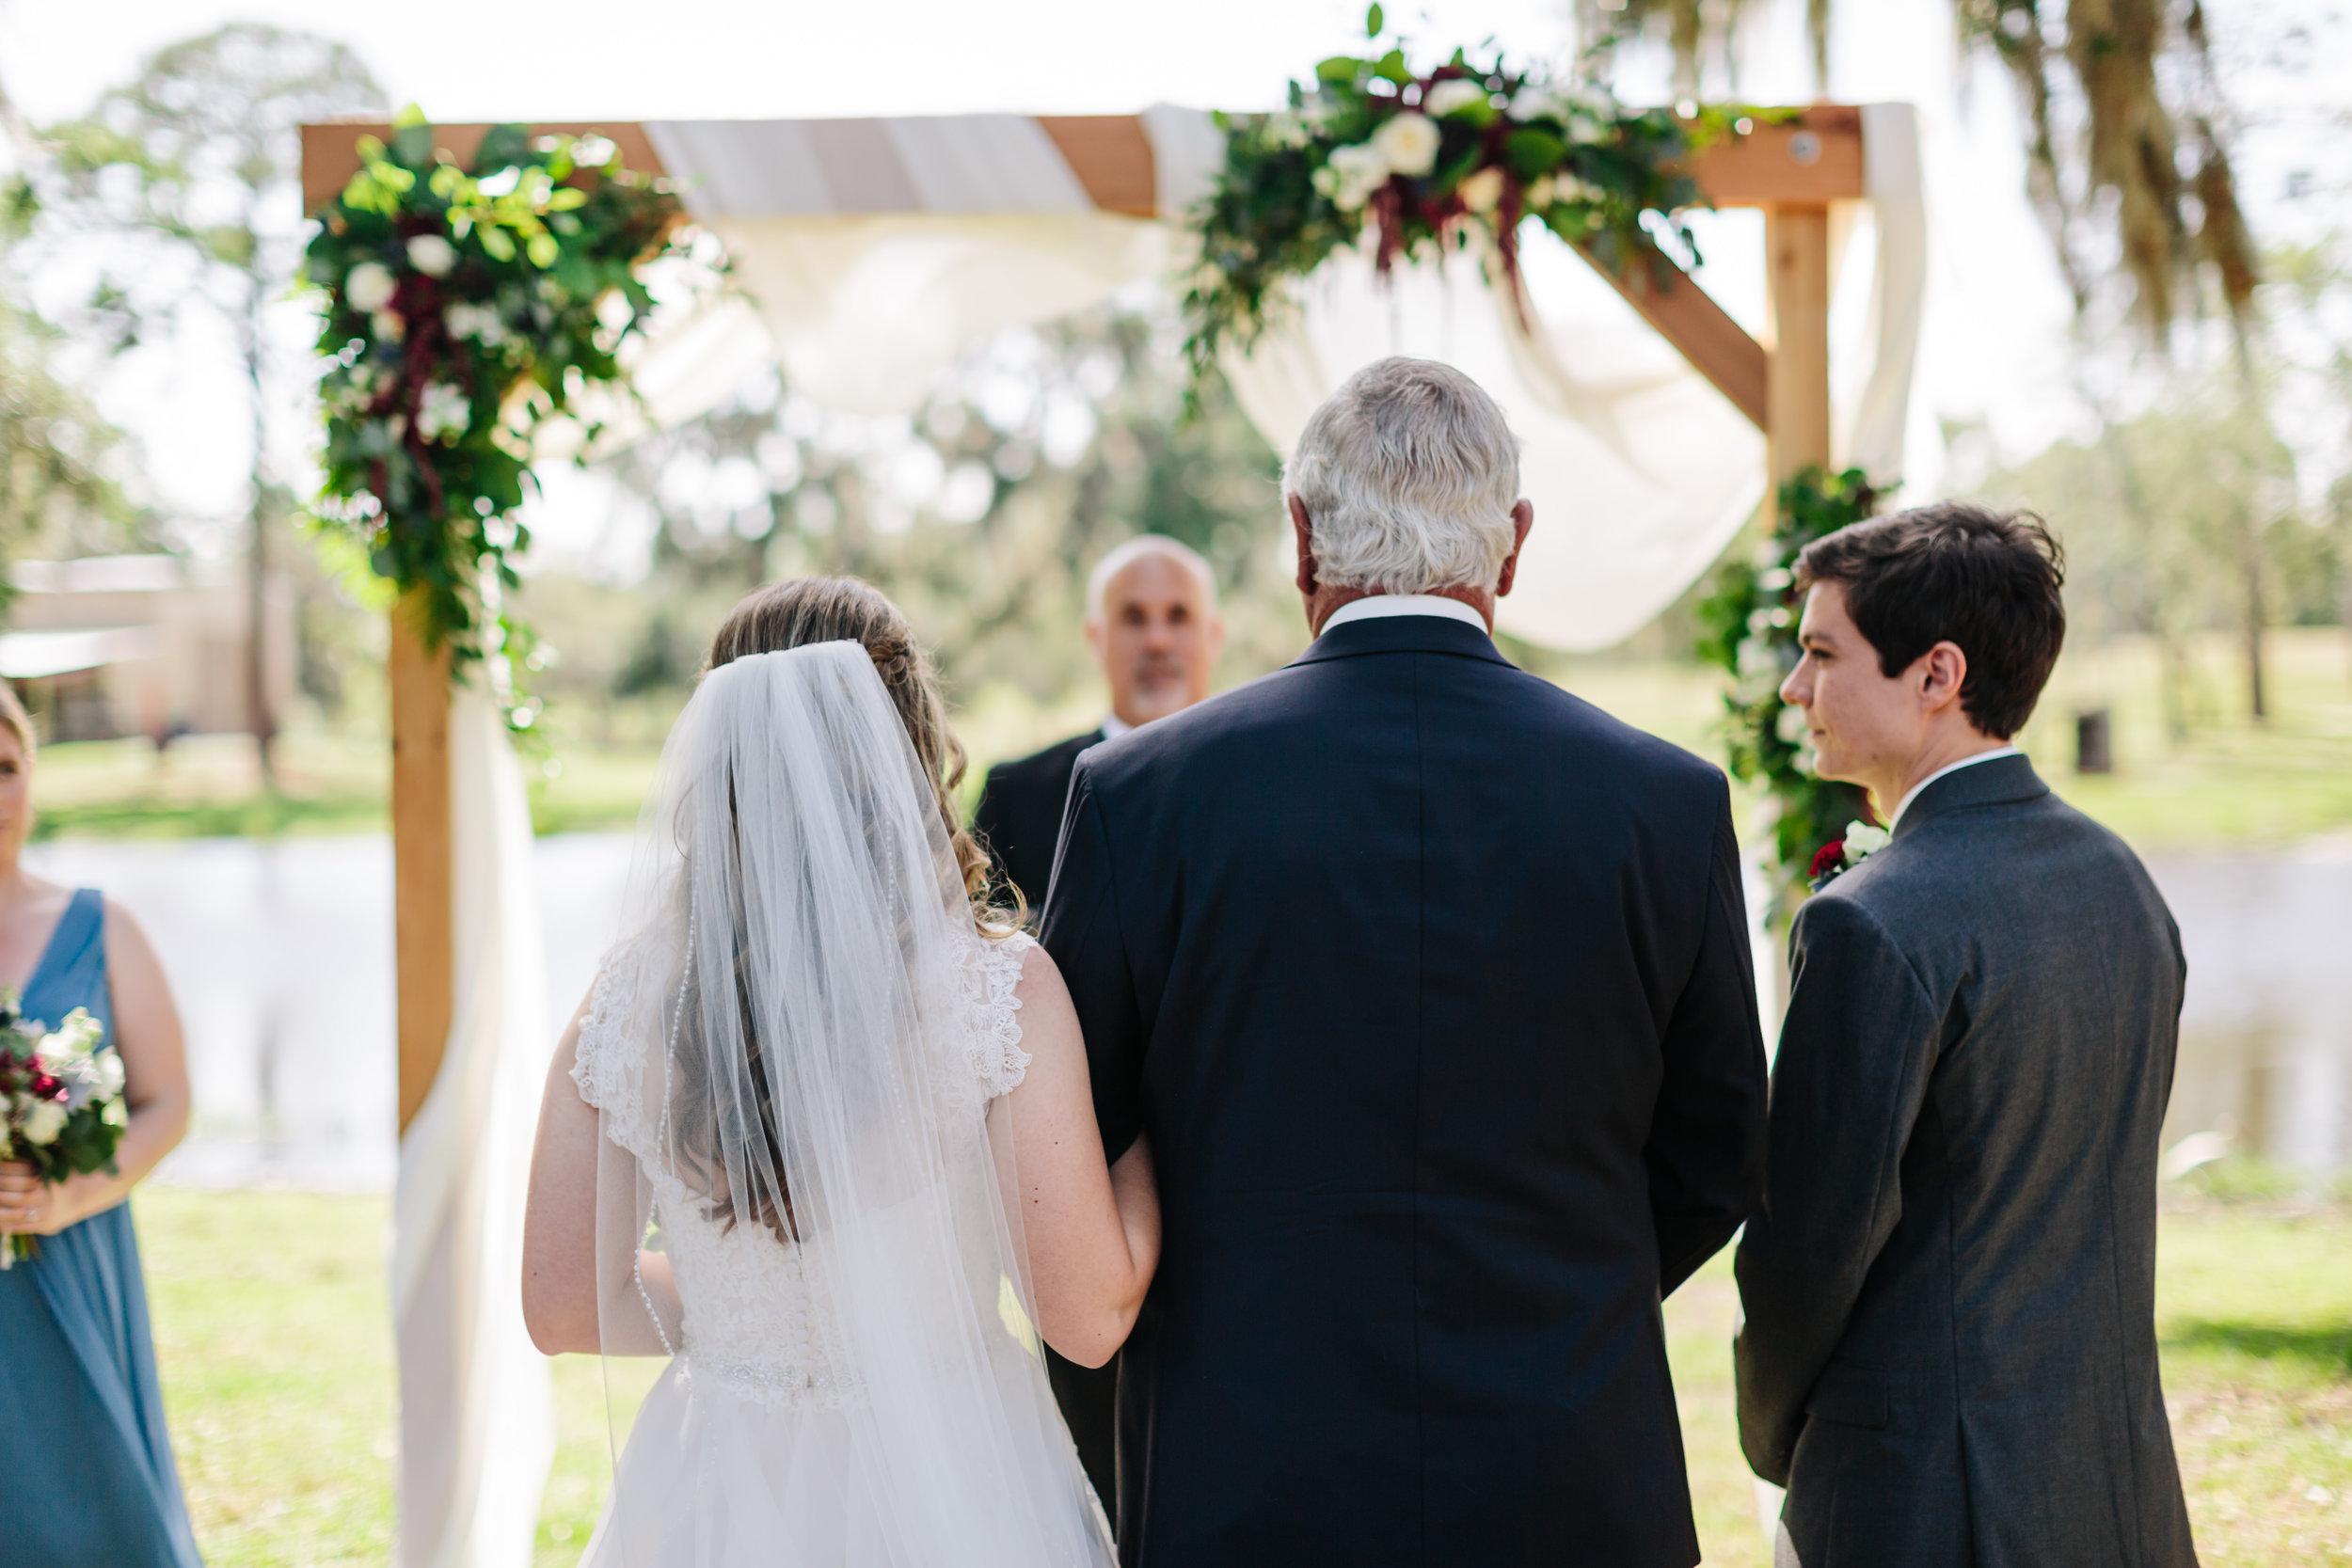 2018.04.14 Zak and Jamisyn Unrue Black Willow Barn Wedding Finals-334.jpg